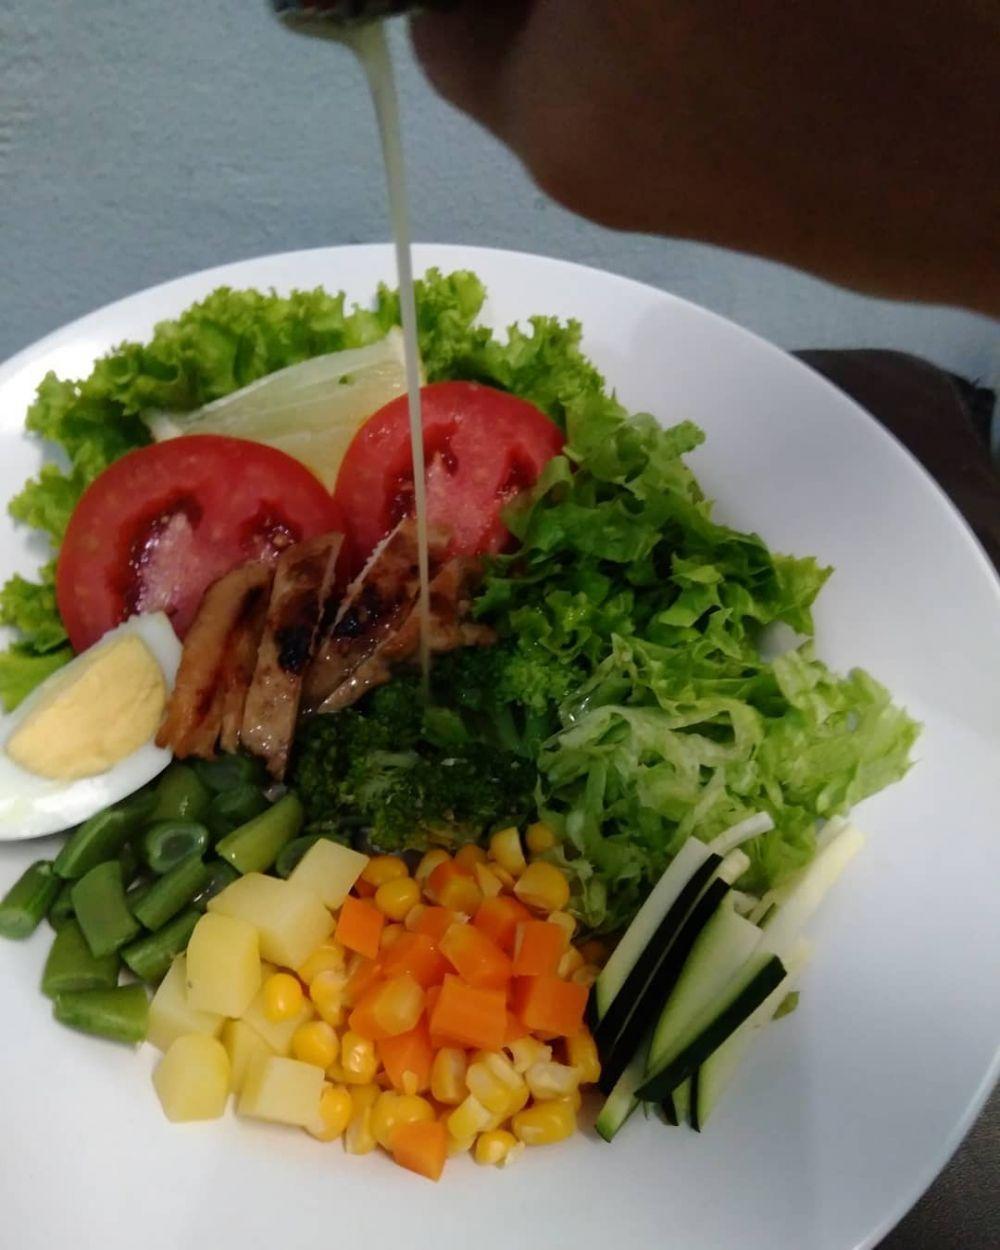 Resep Salad C 2019 Brilio Net Di 2020 Resep Salad Makanan Sehat Salad